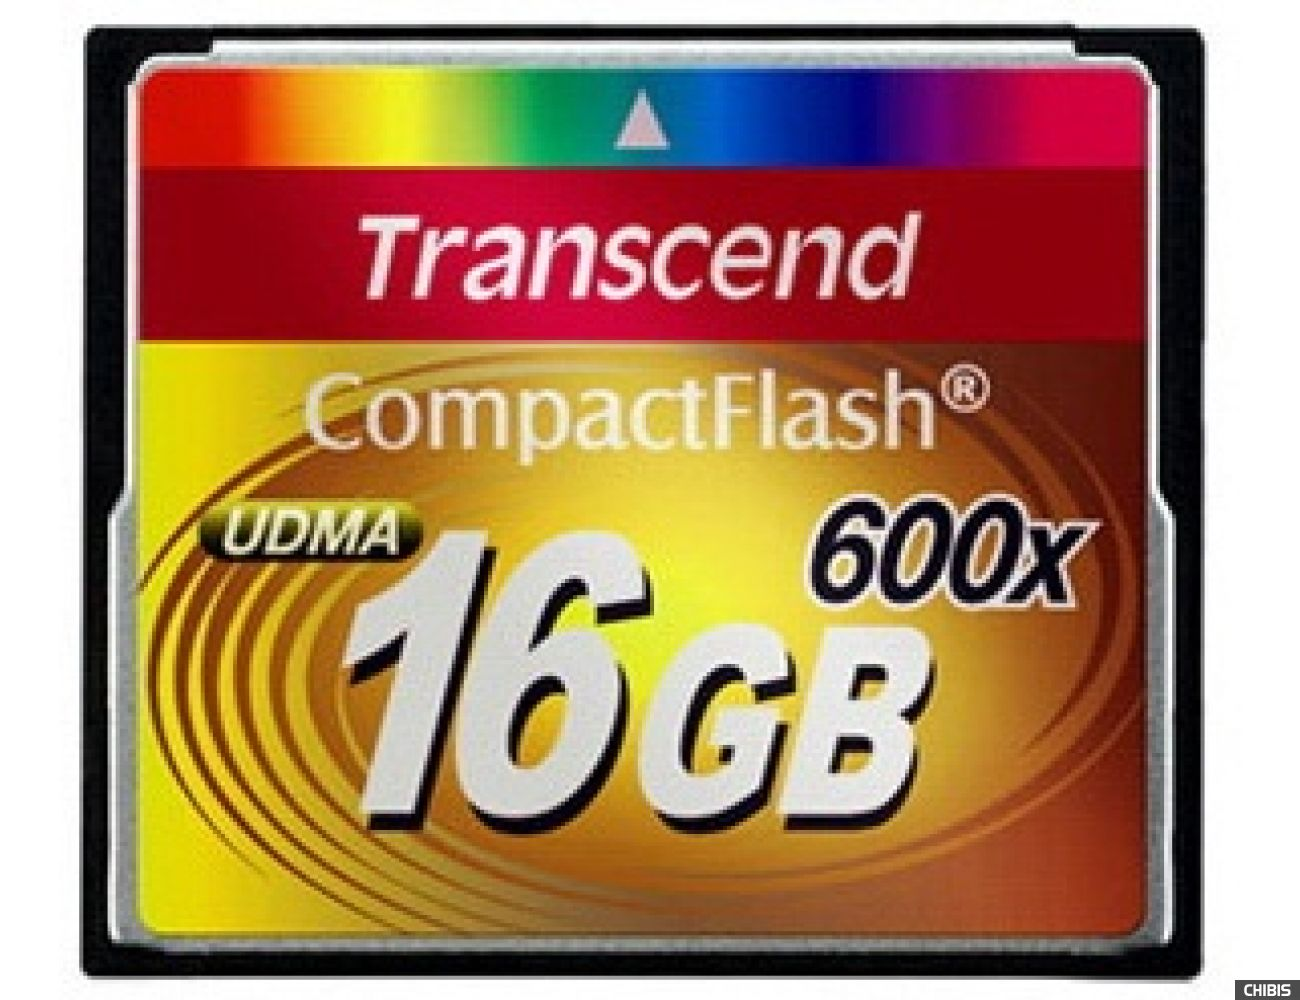 Карта памяти Transcend Compact Flash 600x 16Gb